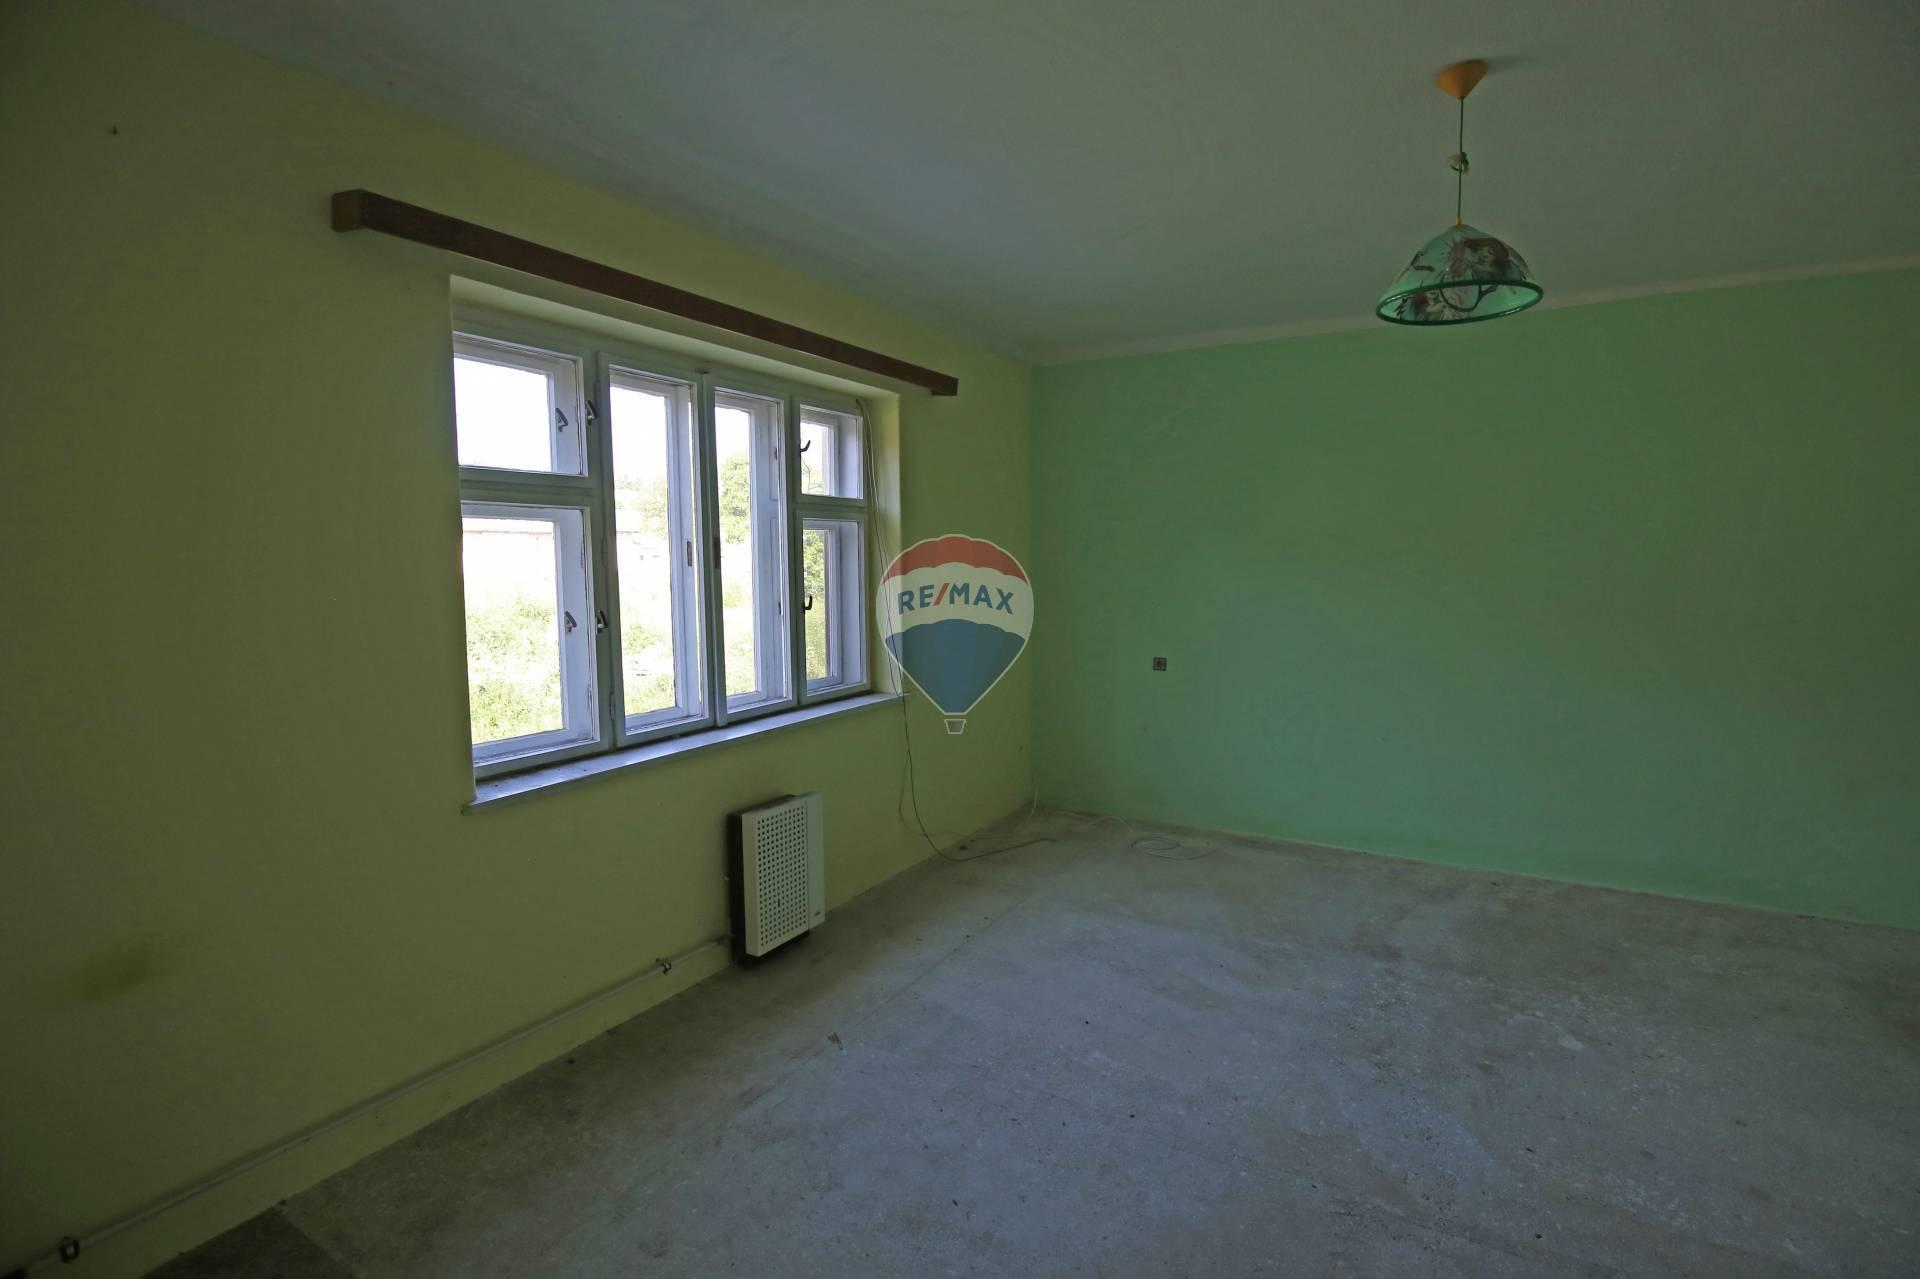 Predaj komerčného objektu 250 m2, Bobot - Predaj domu Bobot